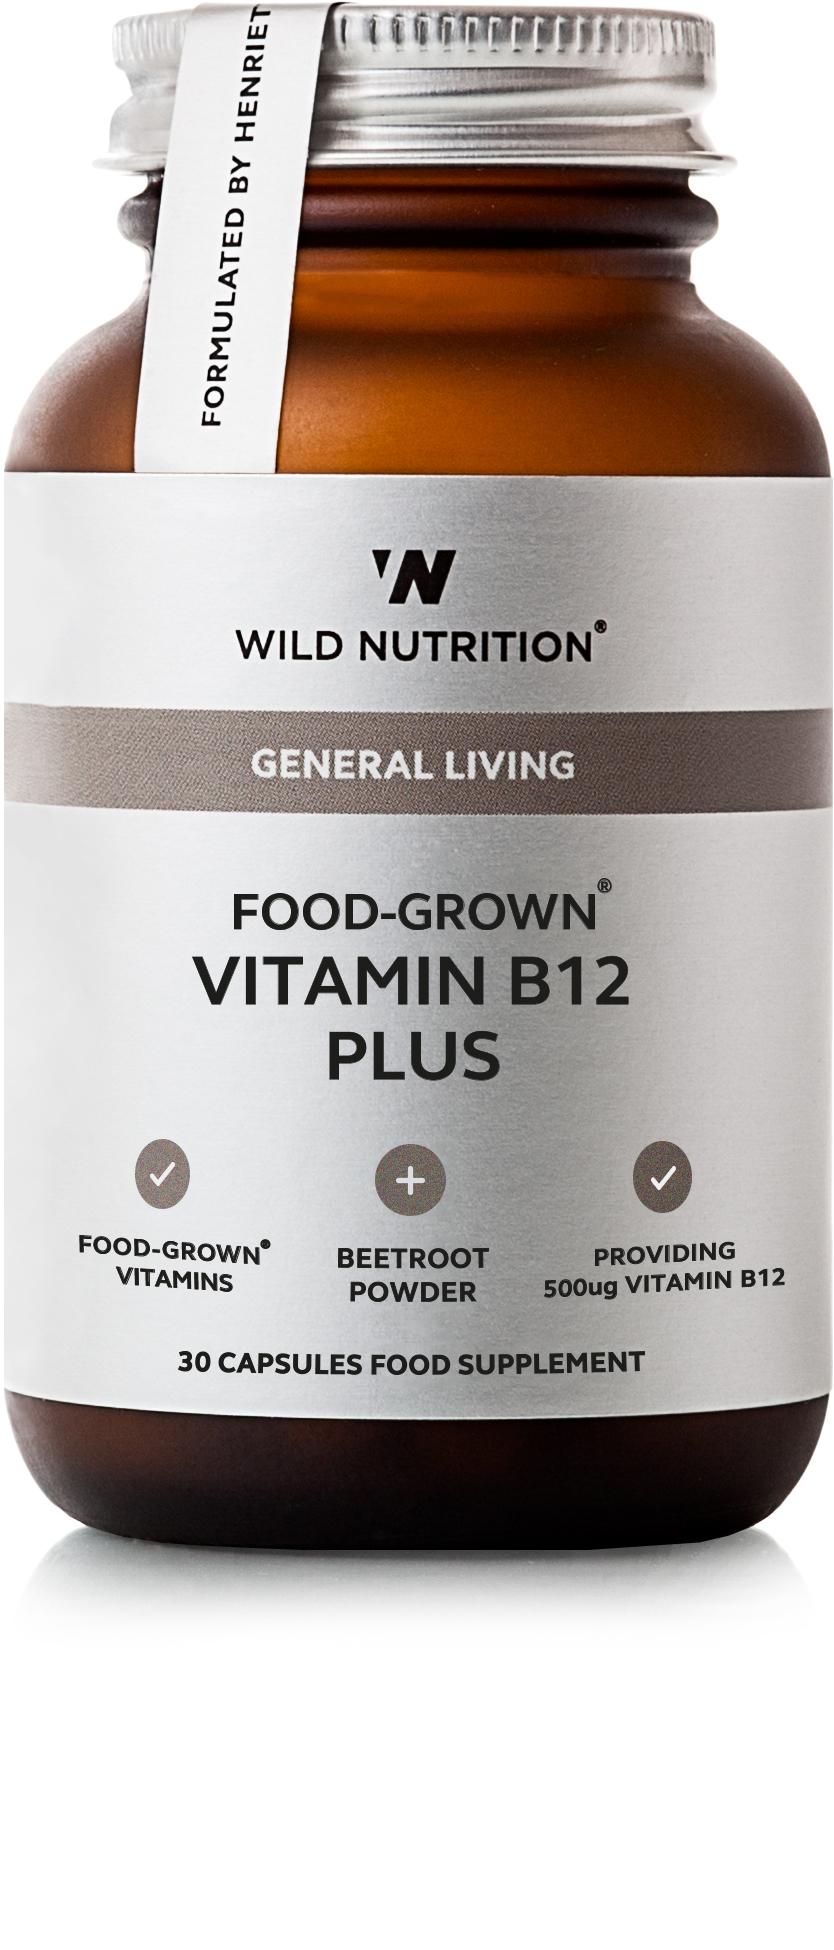 General Living Food-Grown Vitamin B12 Plus 30's